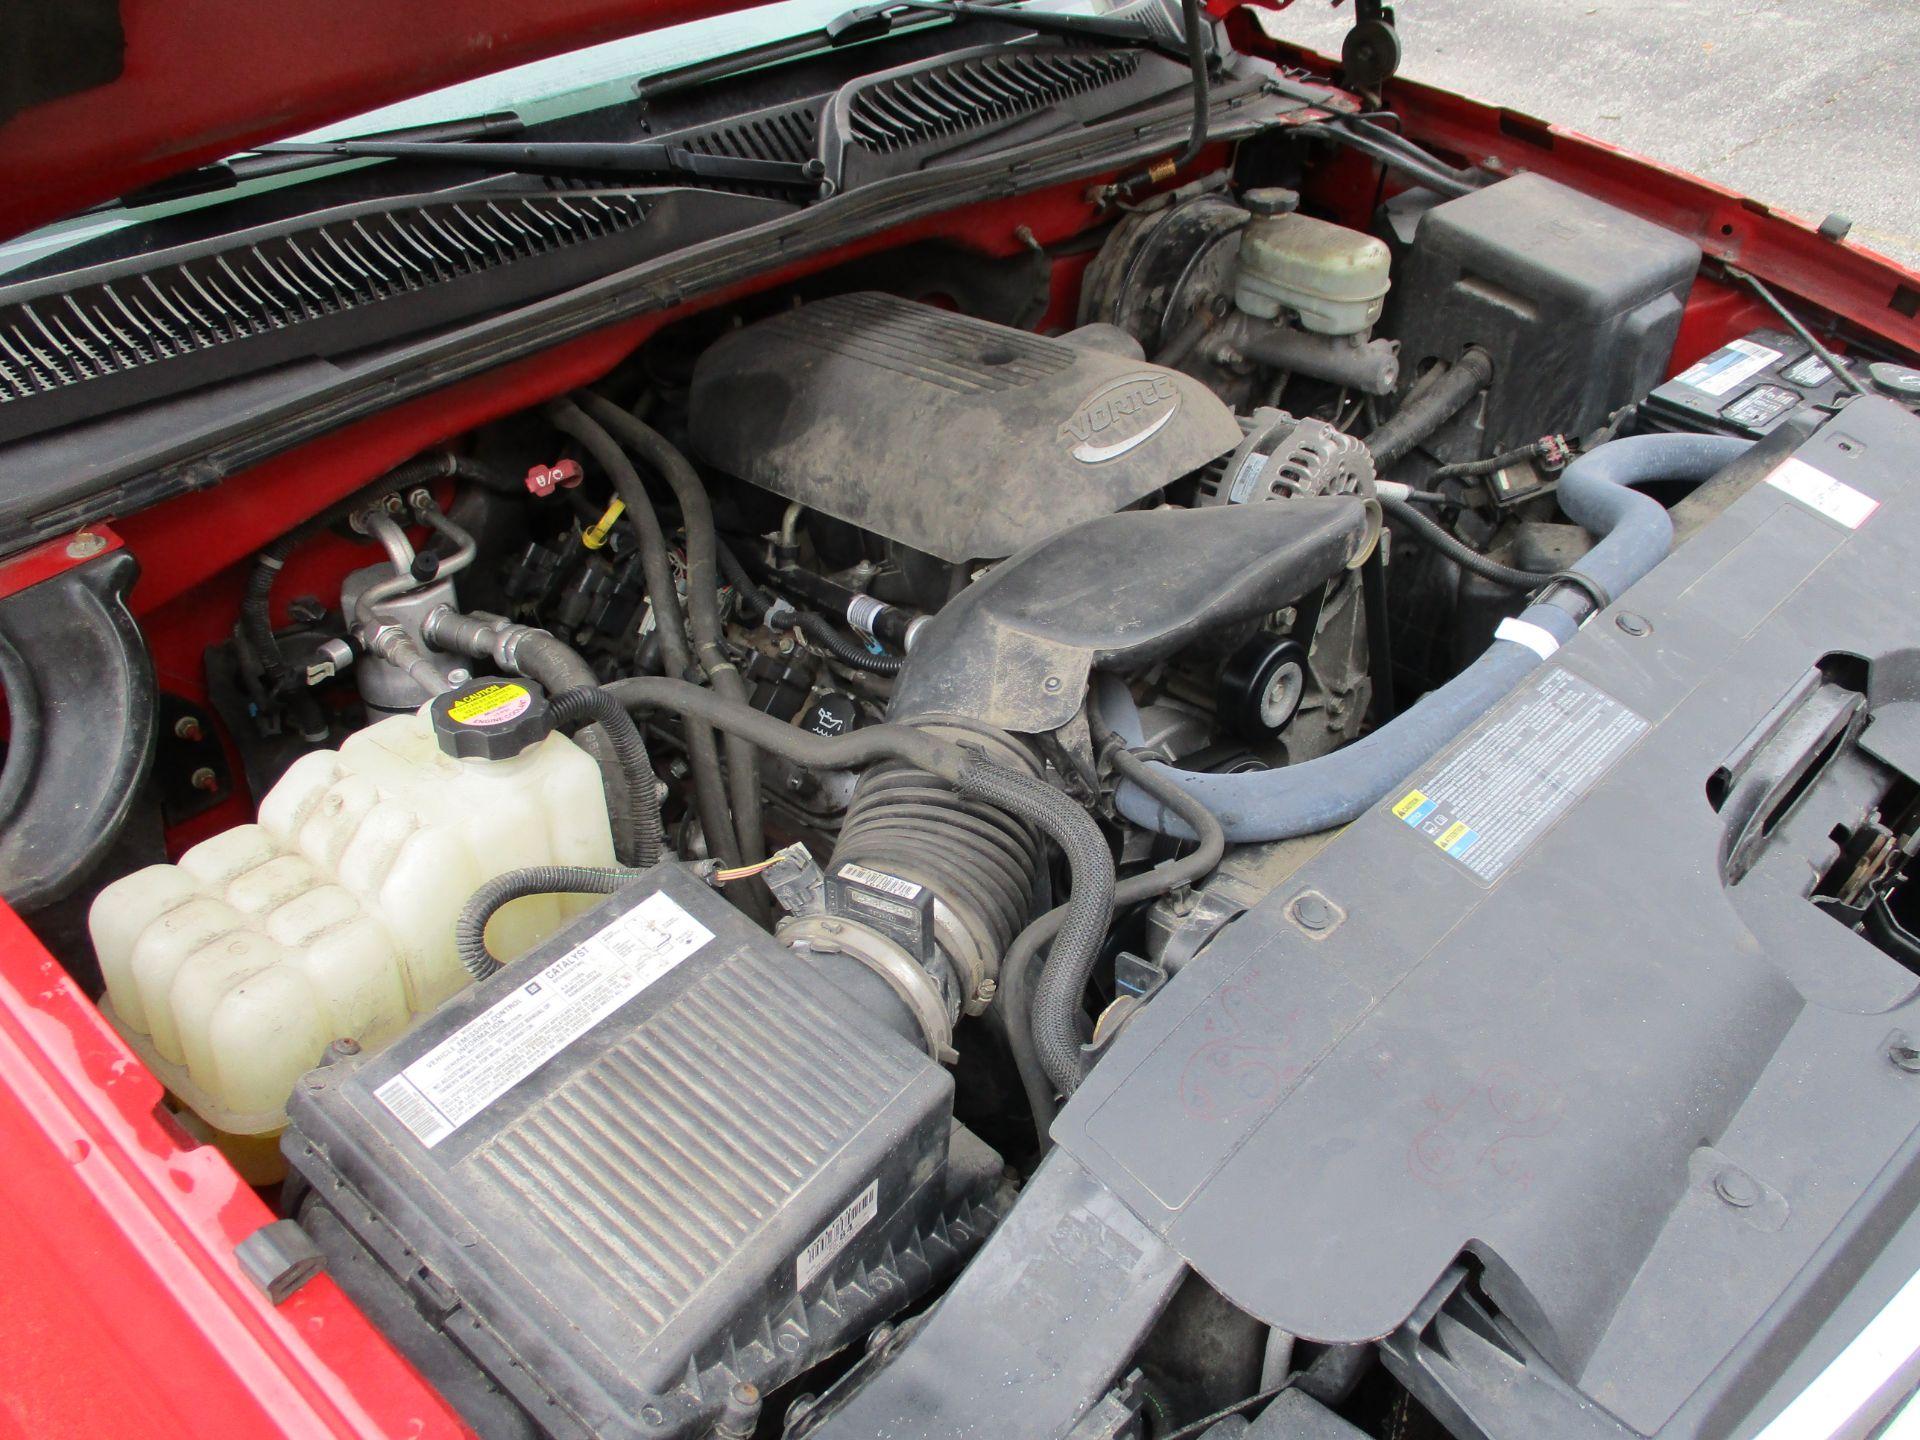 2006 Chevrolet Silverado 1500 LT Pickup, VIN 1GCEC14V96E251510, Regular Cab, Automatic, AC, 8' - Image 21 of 21